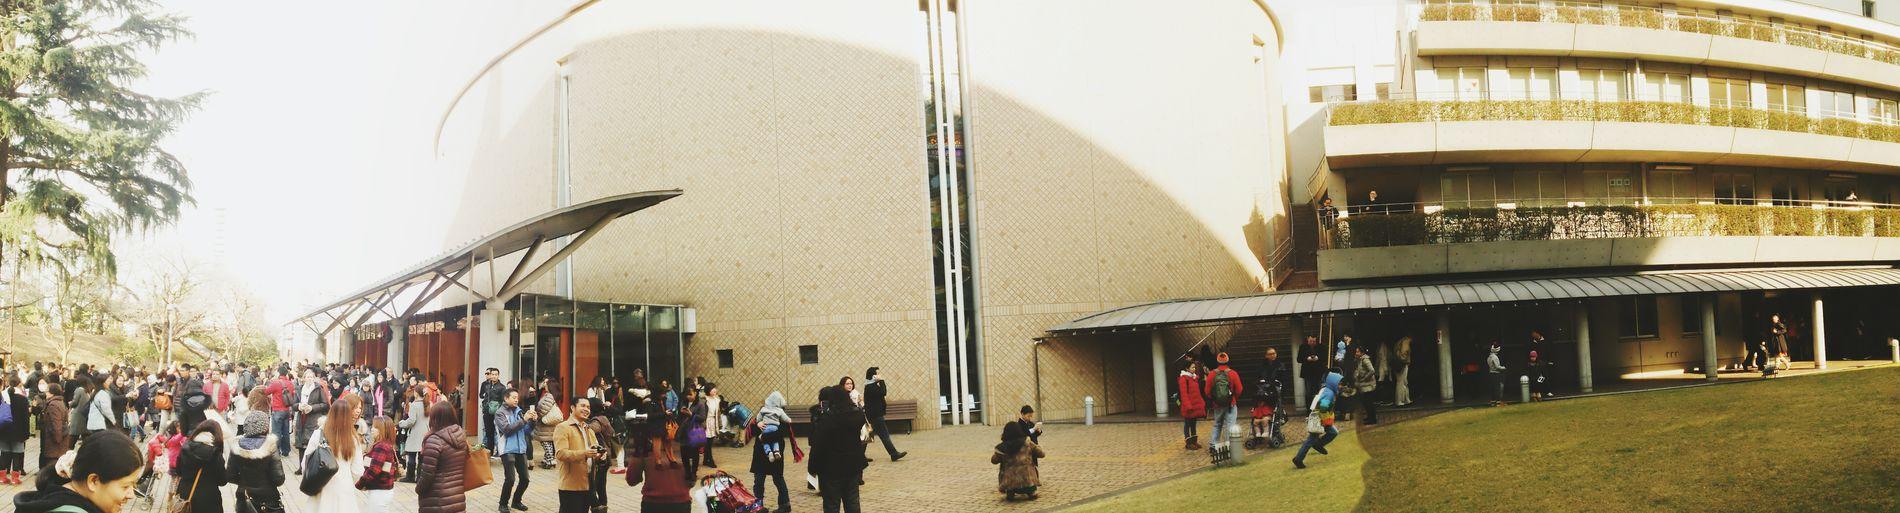 Chirstmas mass. Yotsuya Thursdaymass Church